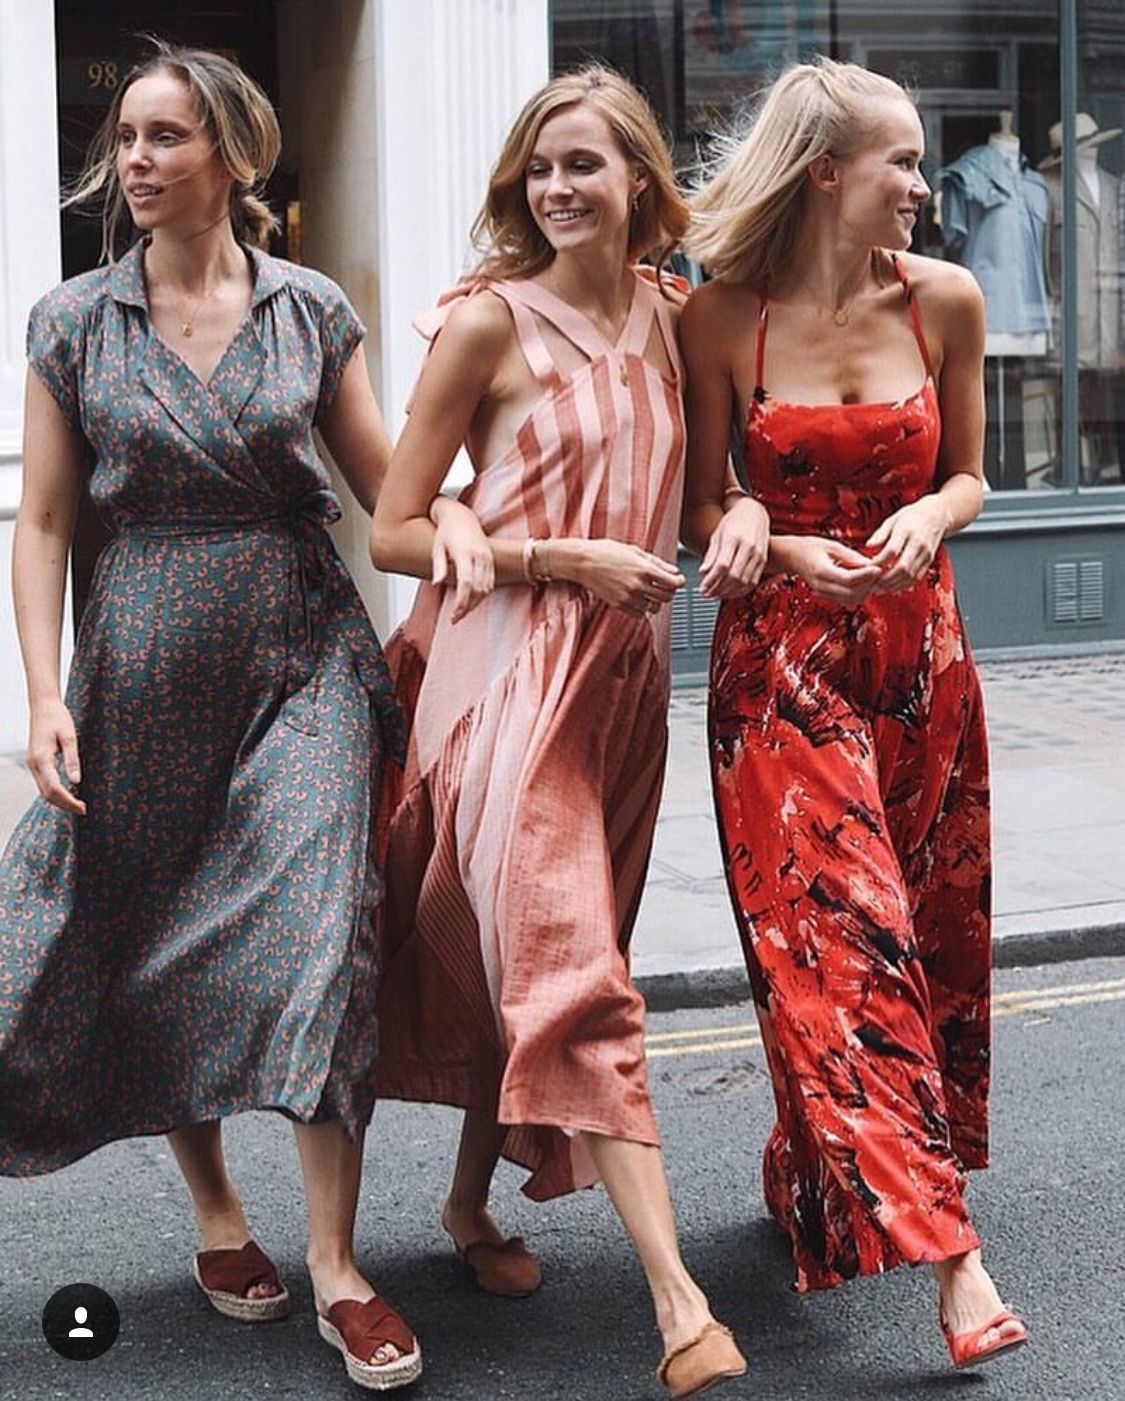 London Street Style The 4 Of Us Wearing Floaty Summer Dresses From Free People Uk Freepeople Londonstreetstyle The4ofus M Faldas Largas De Moda Faldas